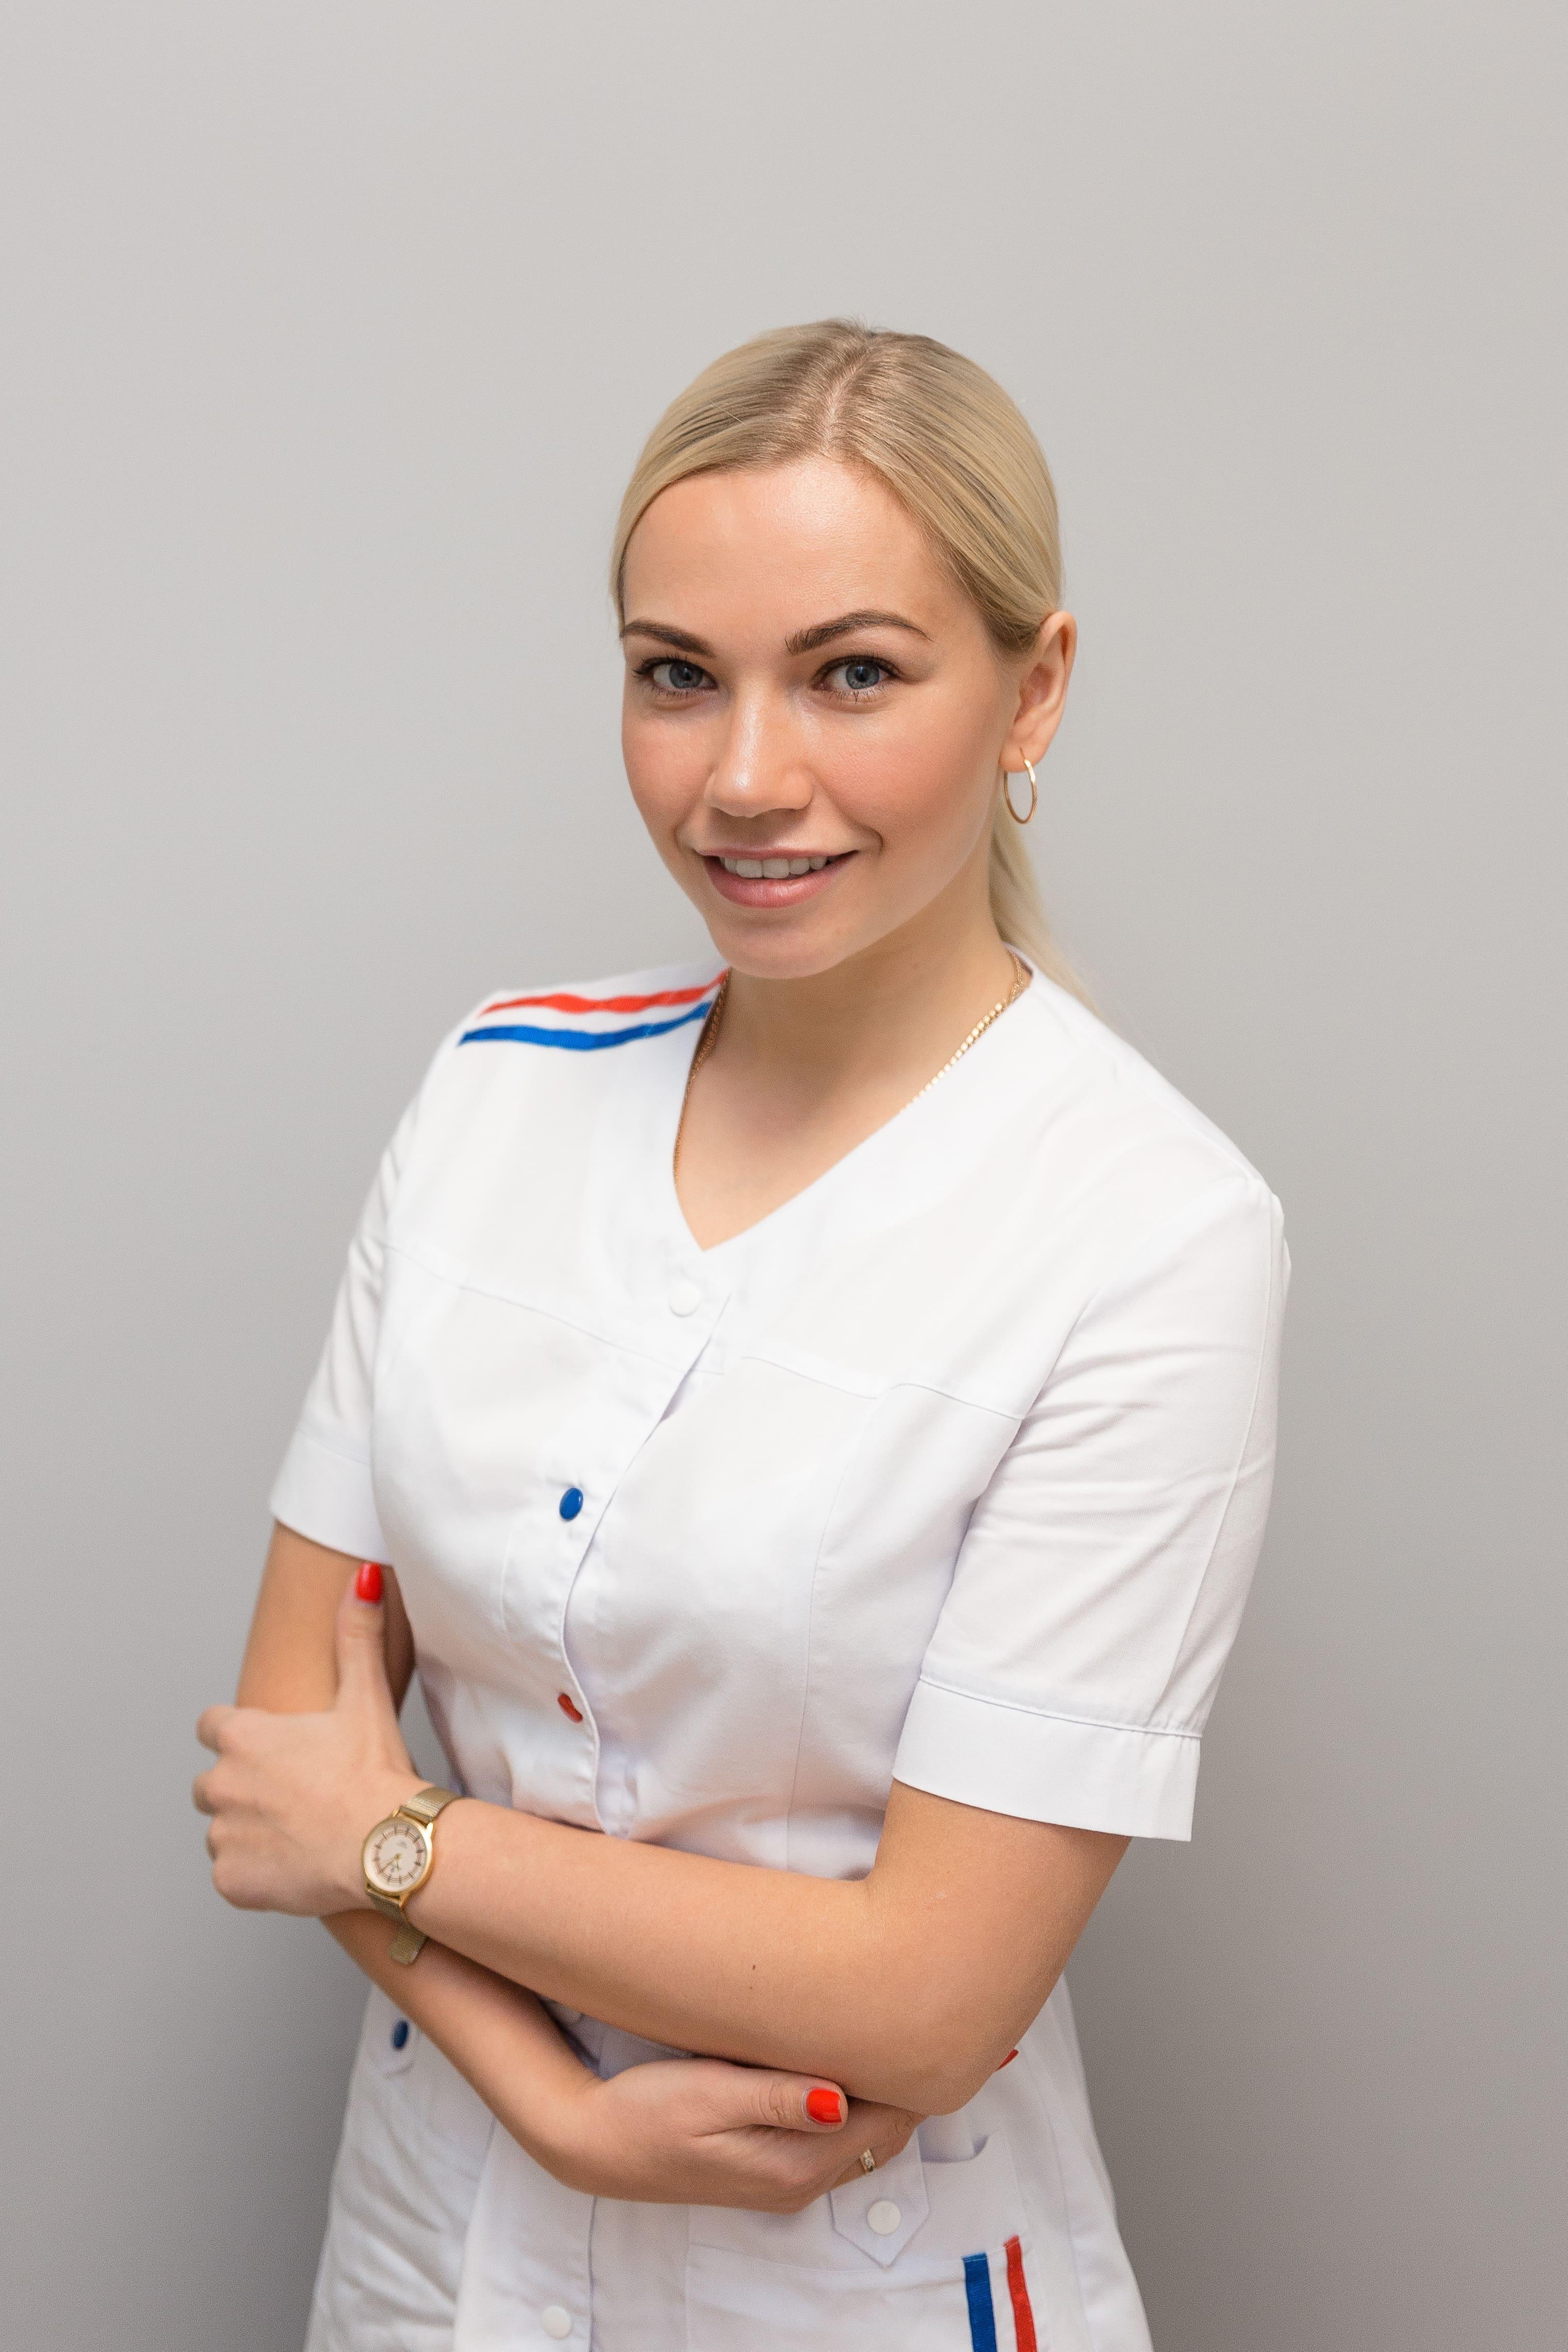 Соленова Анастасия Геннадьевна